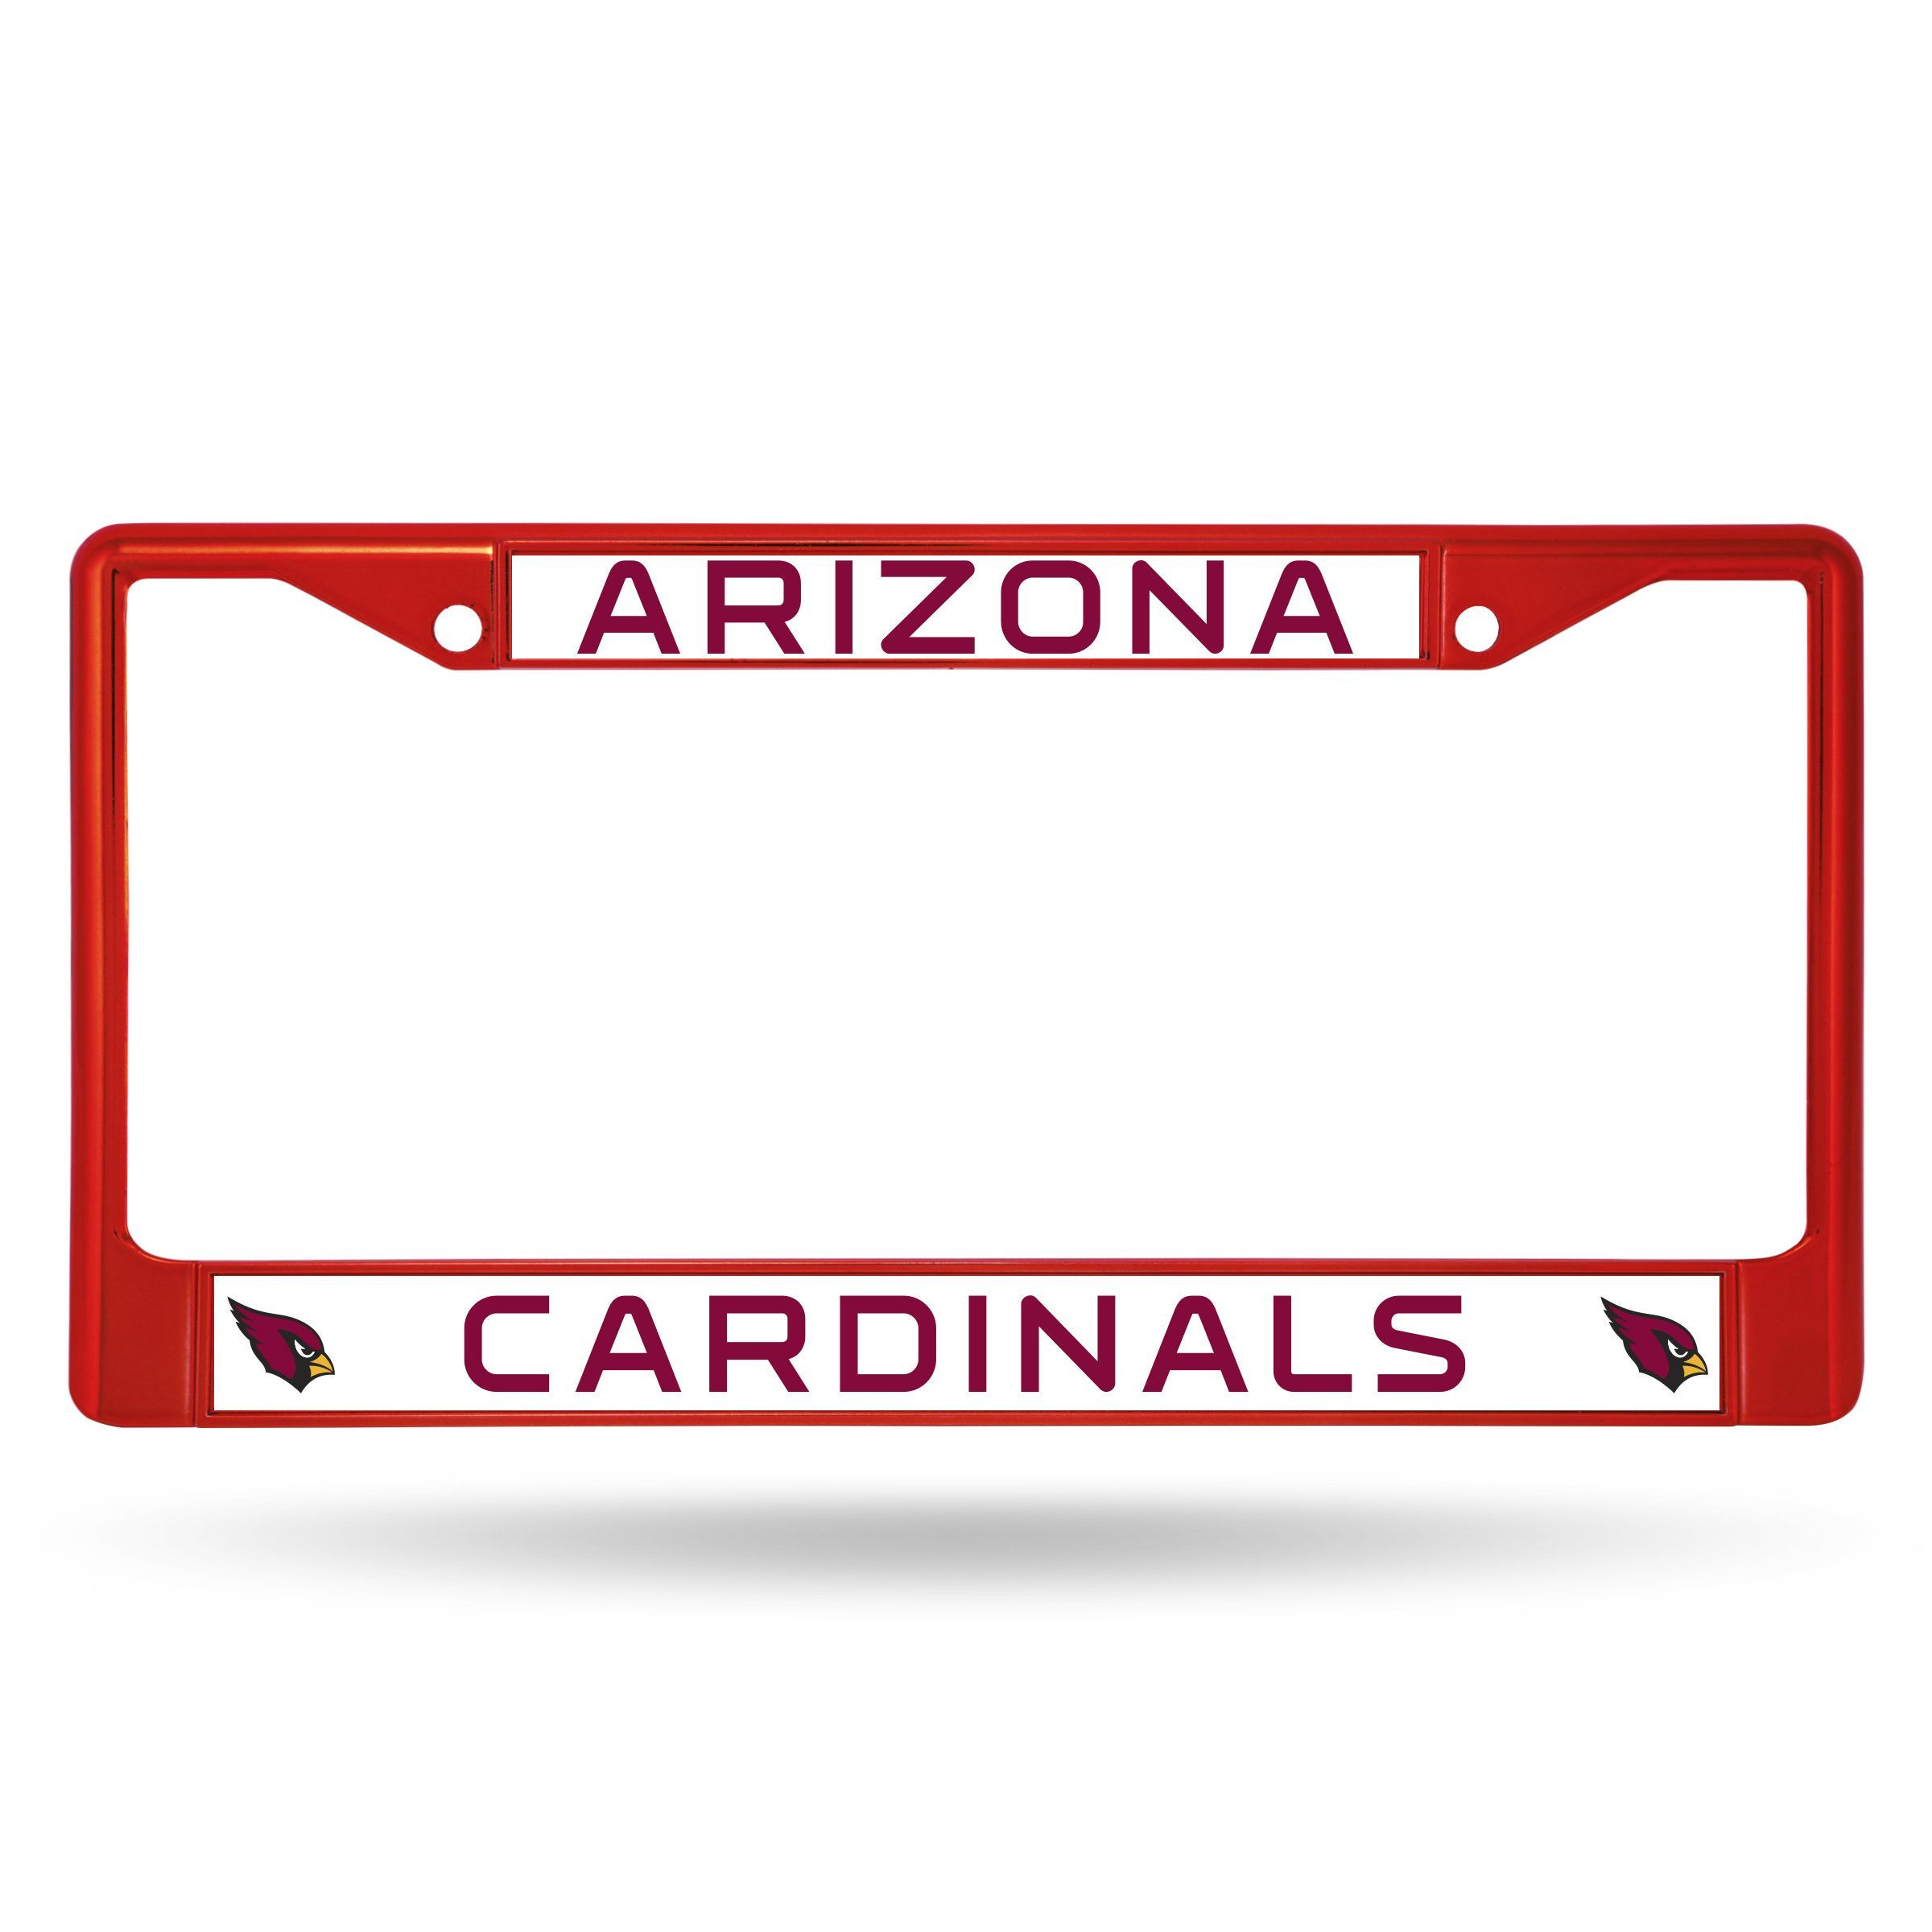 Cardinals Metal License Plate Frame - Red